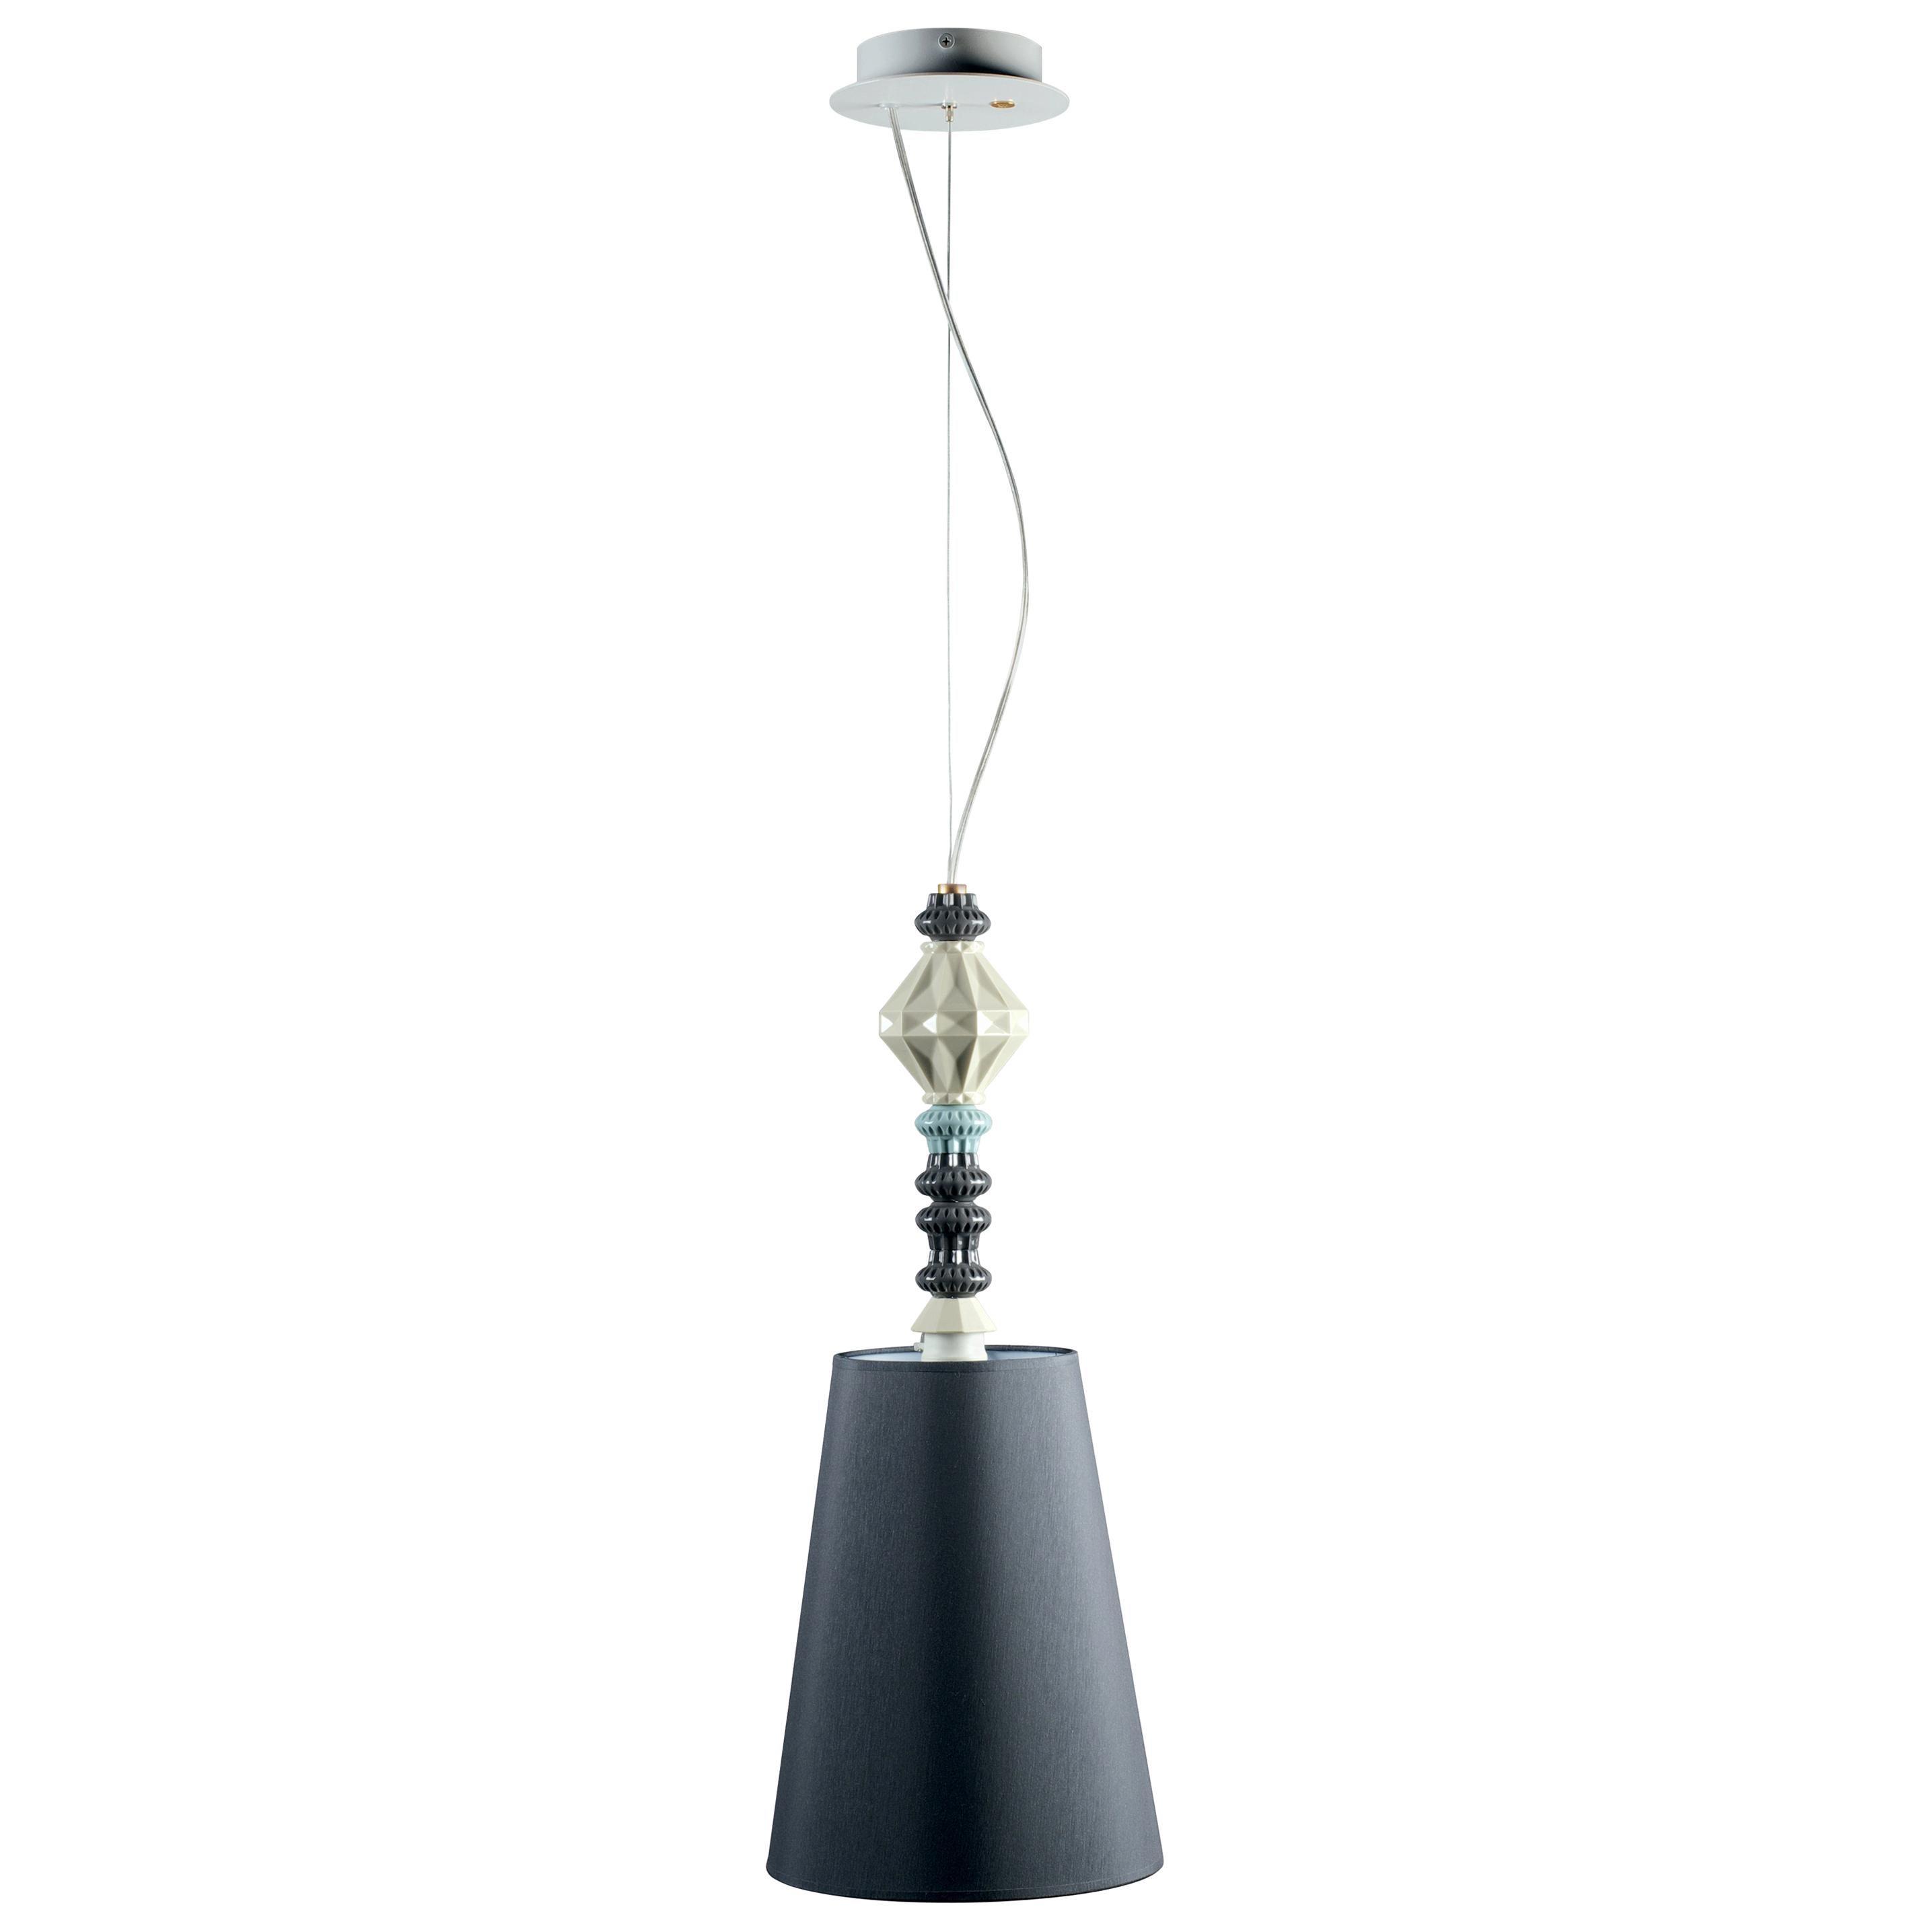 Lladro Belle de Nuit Ceiling Lamp I by